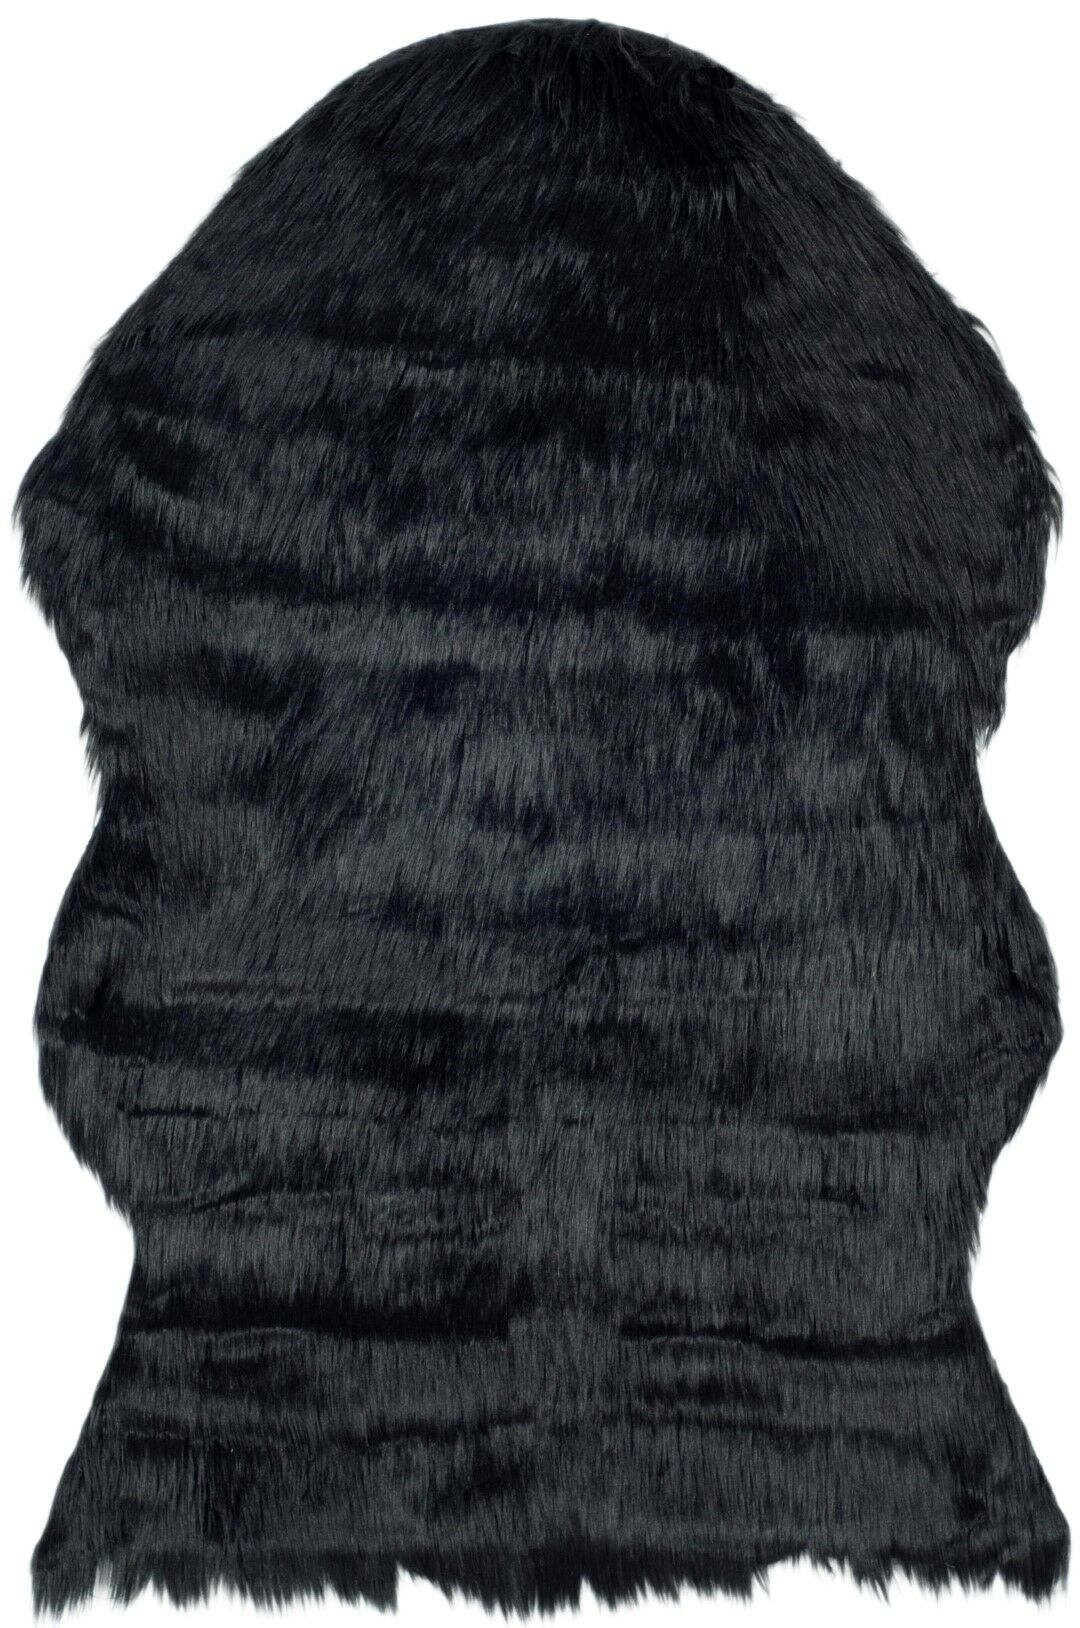 Isacc TuftedFaux Sheepskin Black Area Rug Rug Size: Runner 2'6